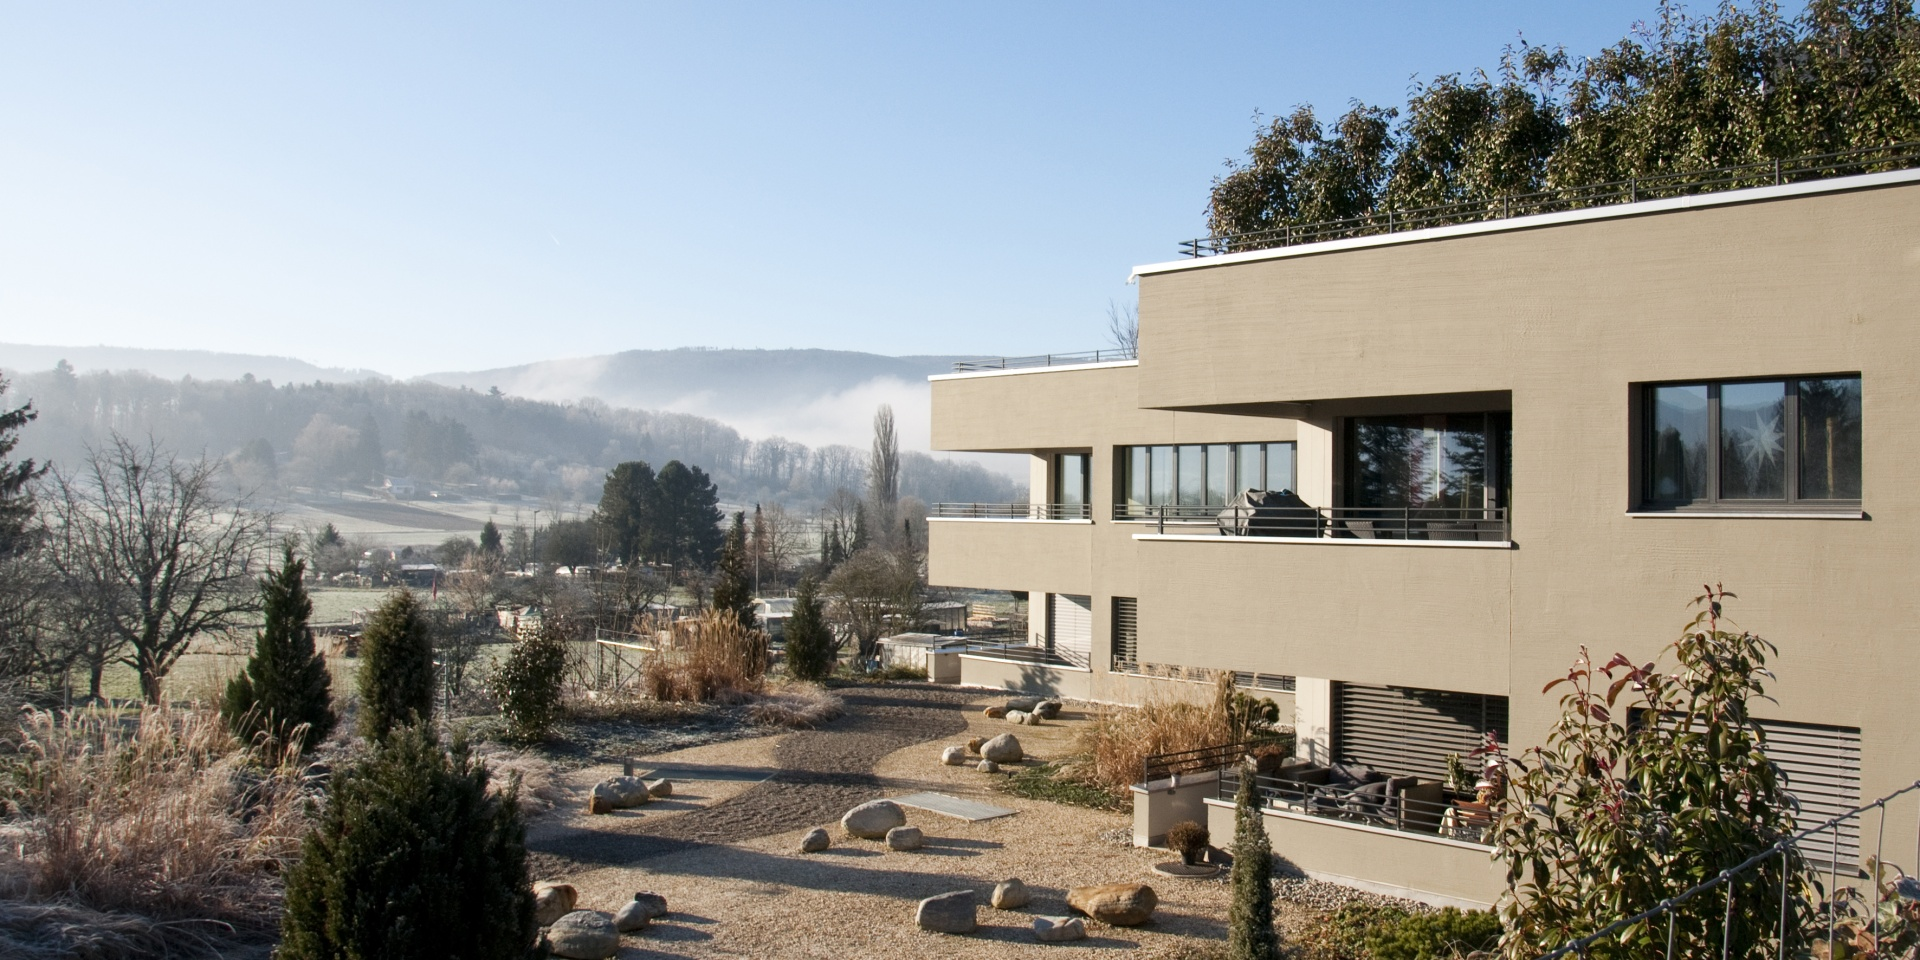 © Architektur Rolf Stalder AG